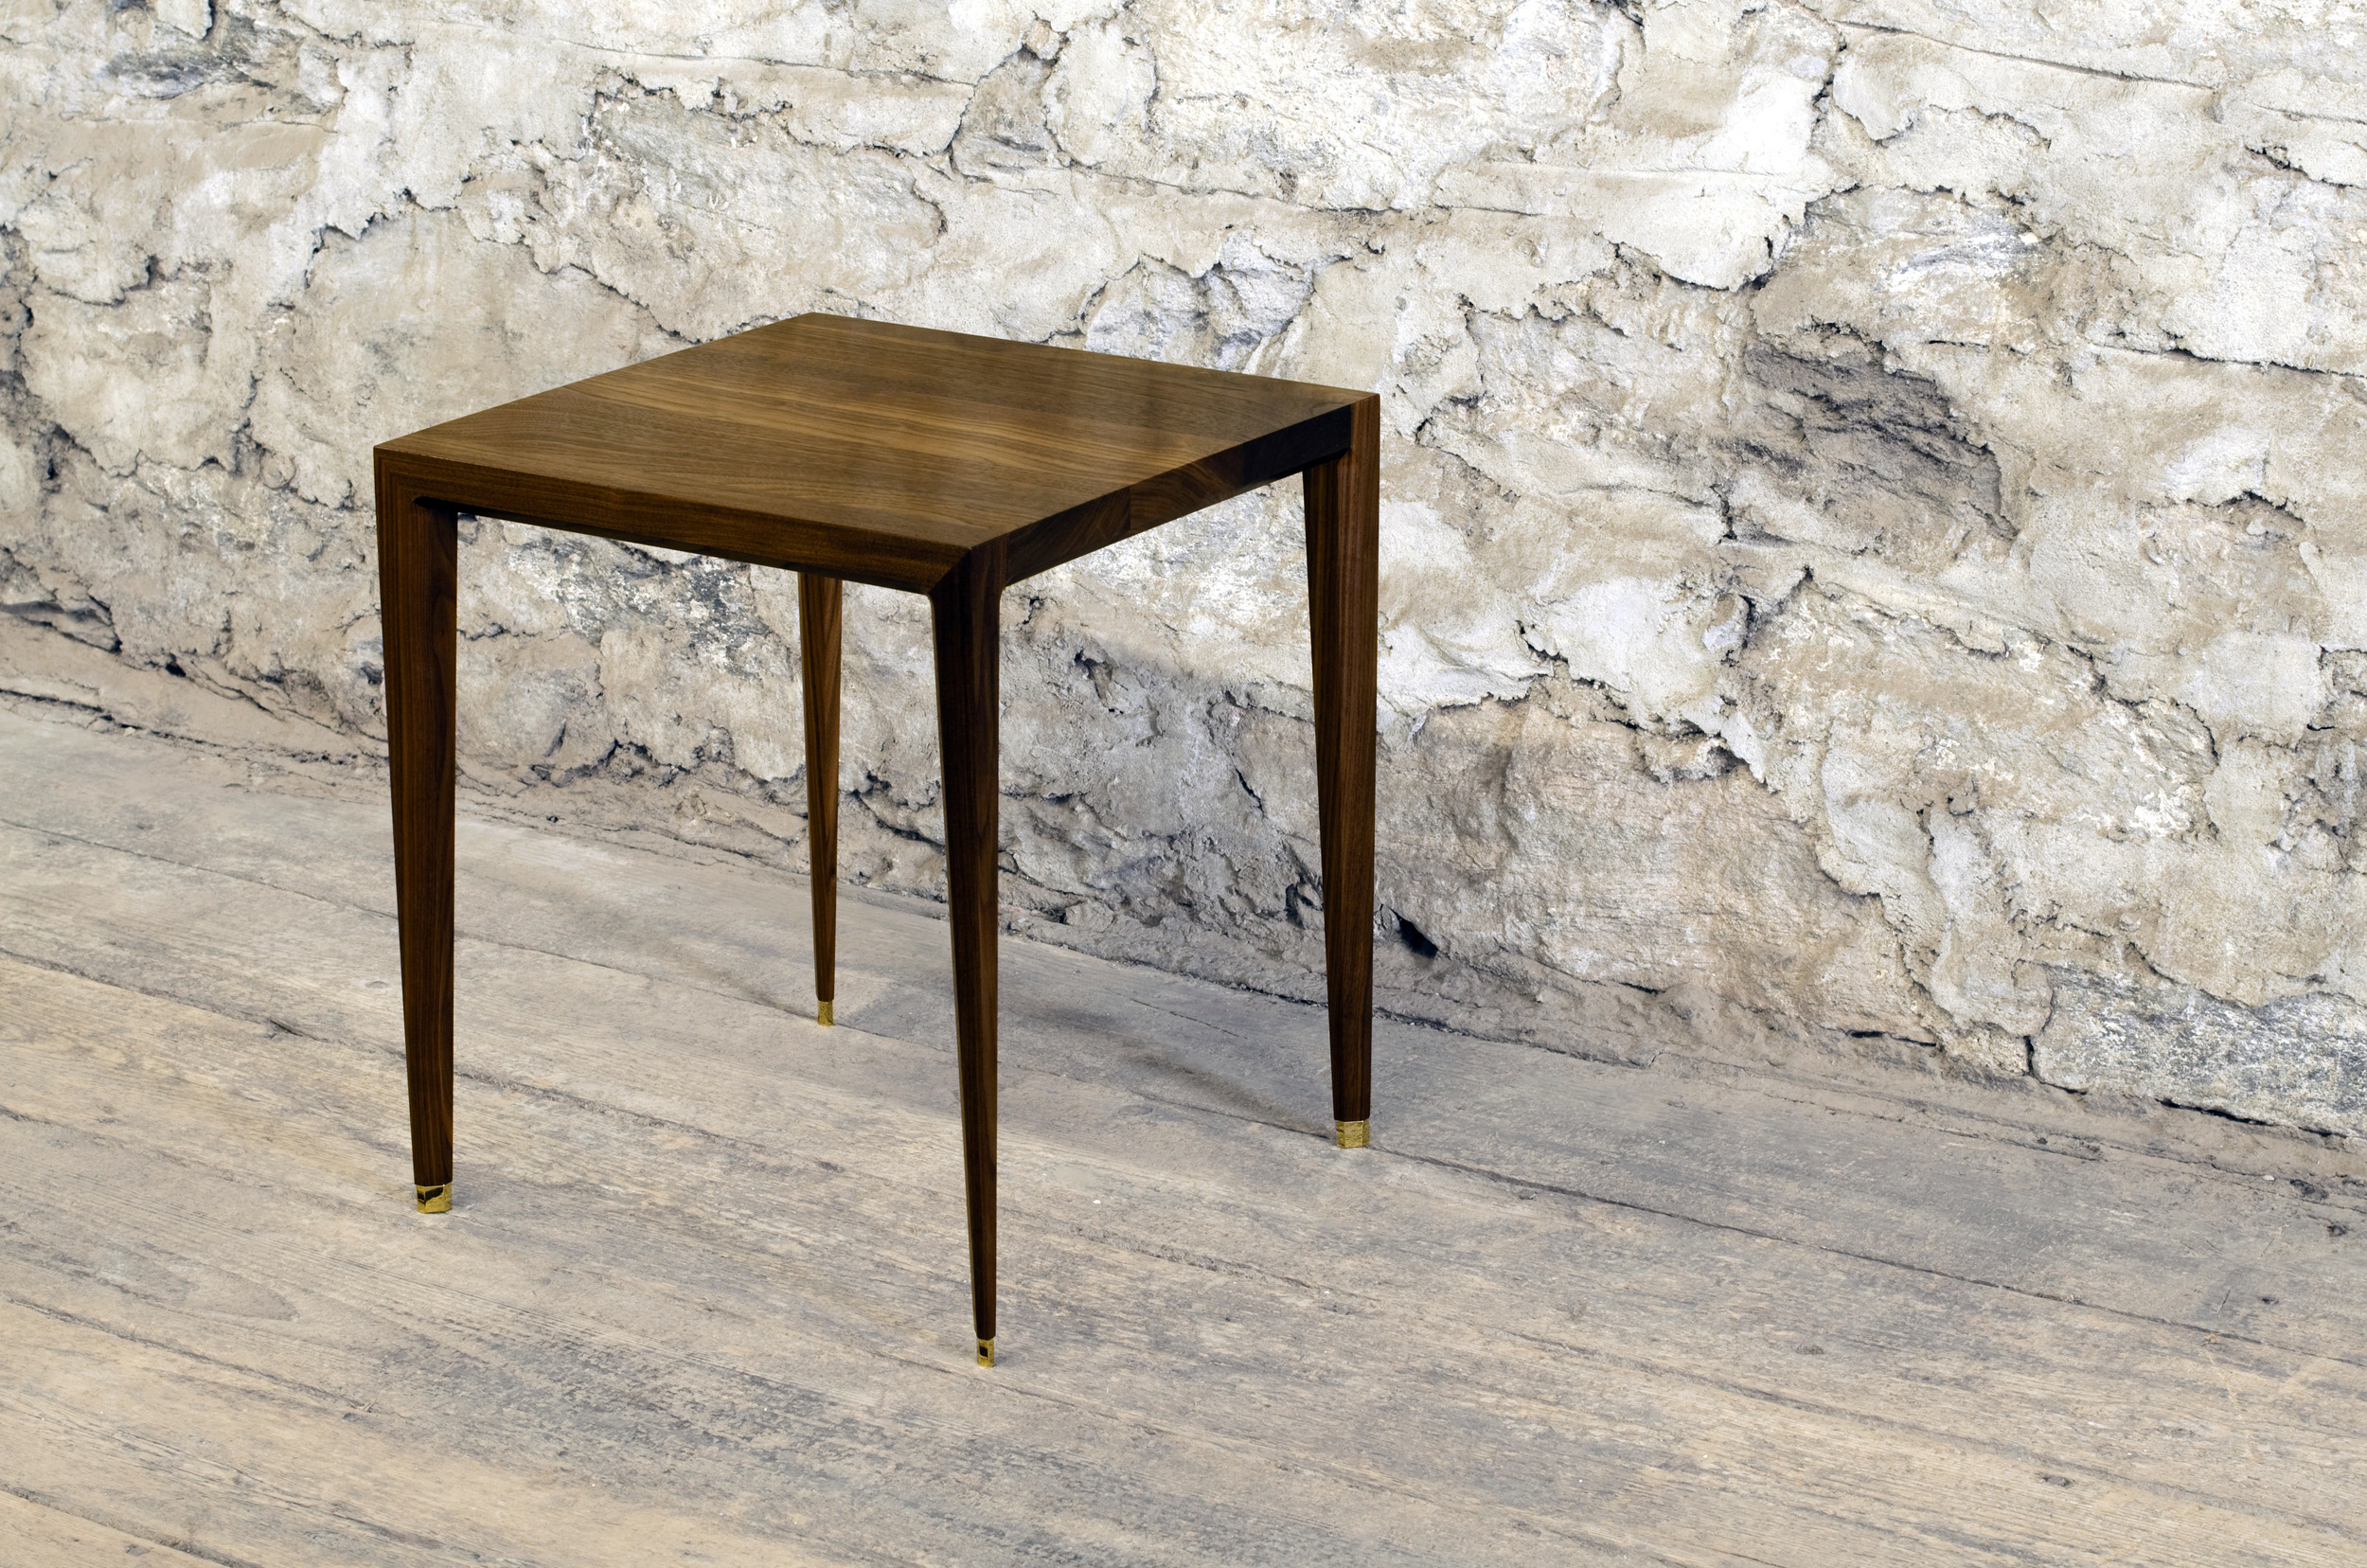 Jerry Nance - San Simeon Table 0.jpg